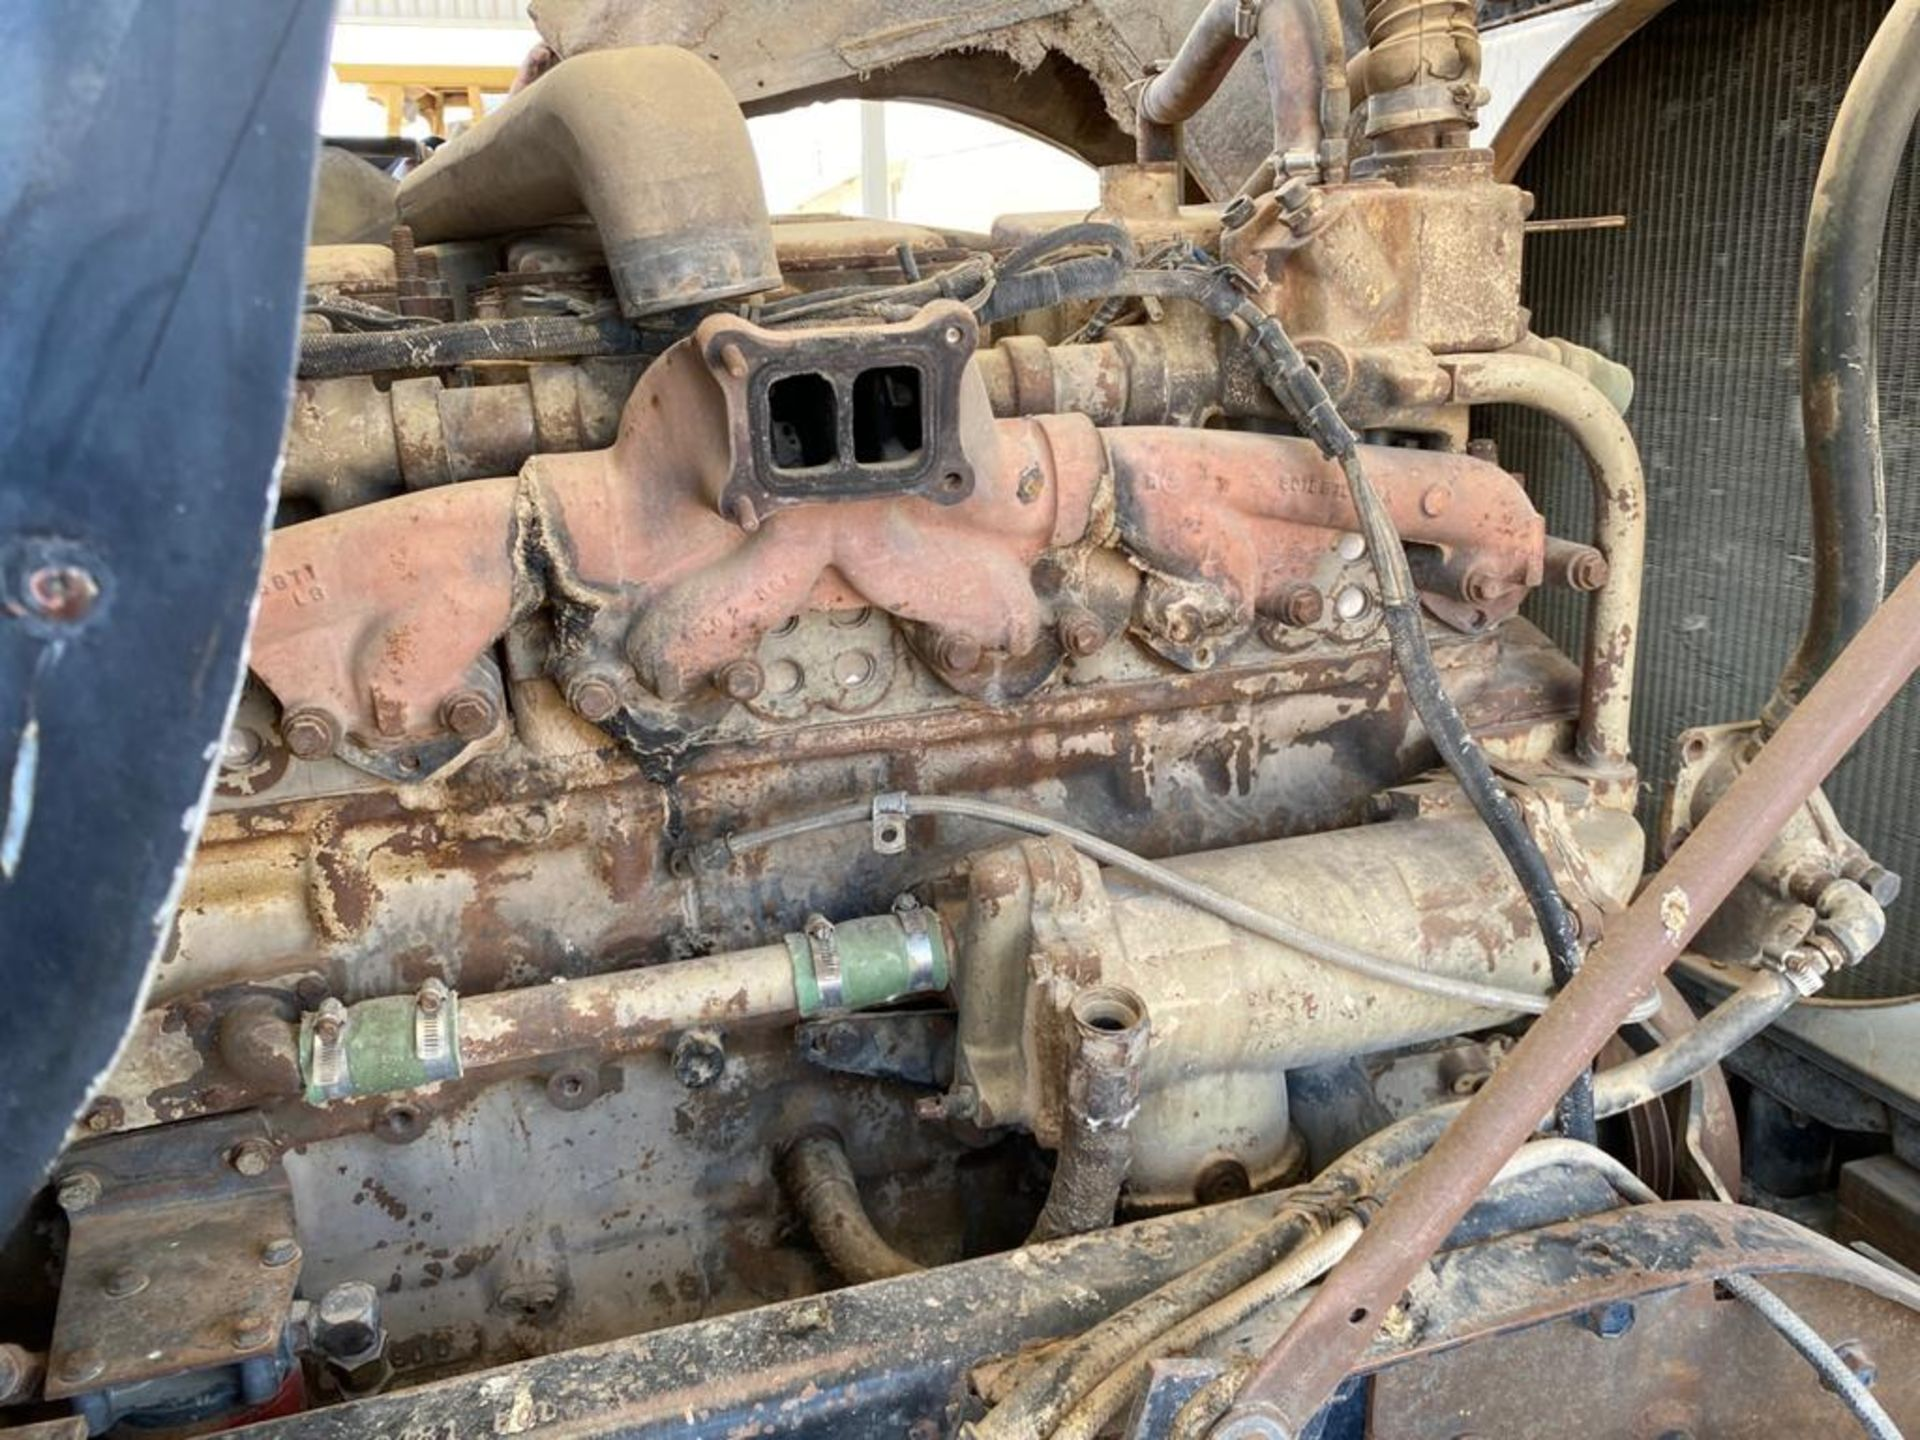 1983 Kenworth Dump Truck, standard transmission of 10 speeds, with Cummins motor - Image 39 of 68